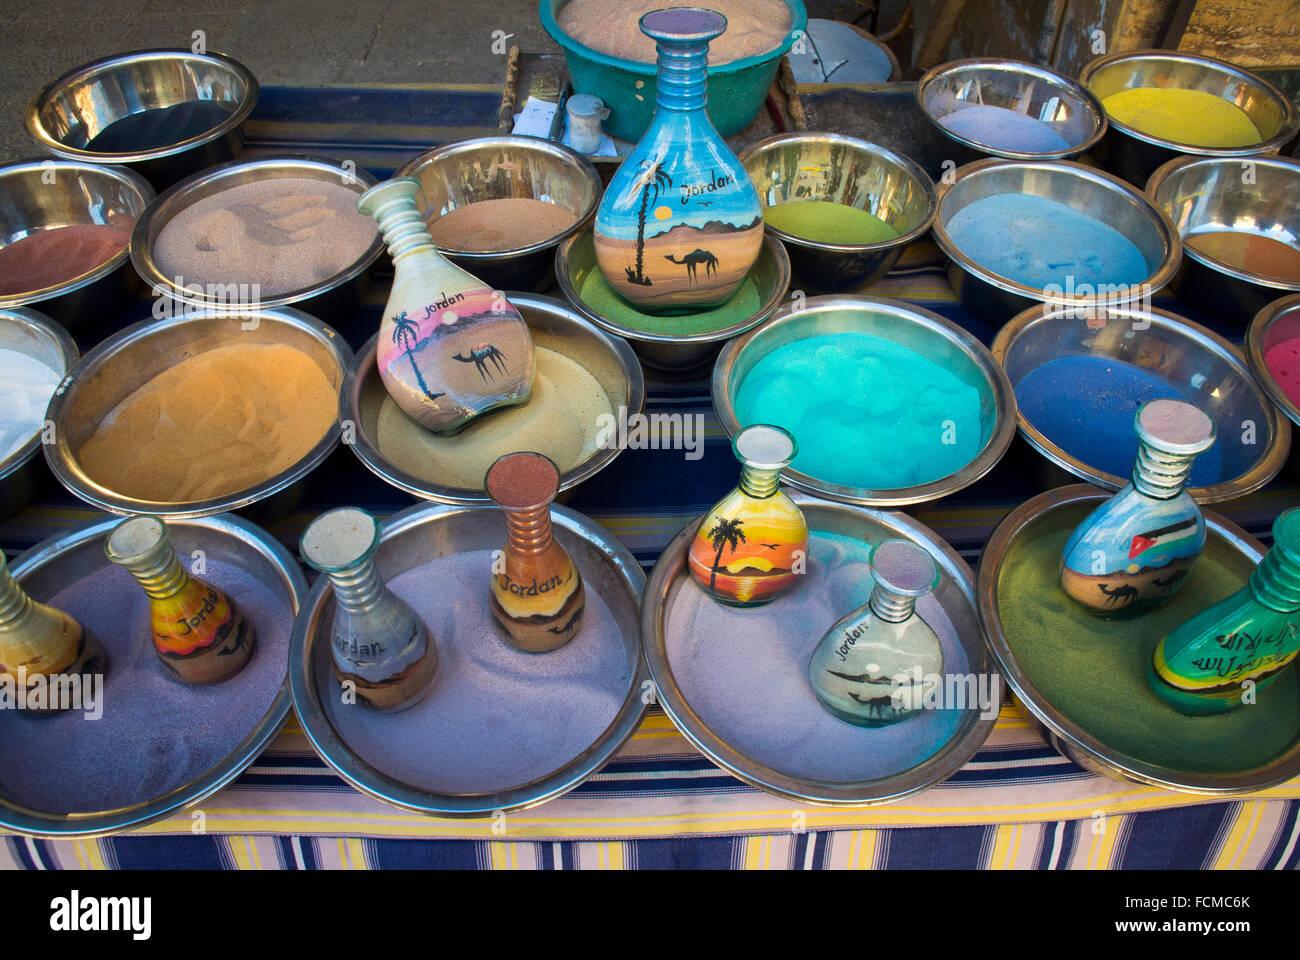 Tourist gifts in Aqaba, Jordan. - Stock Image